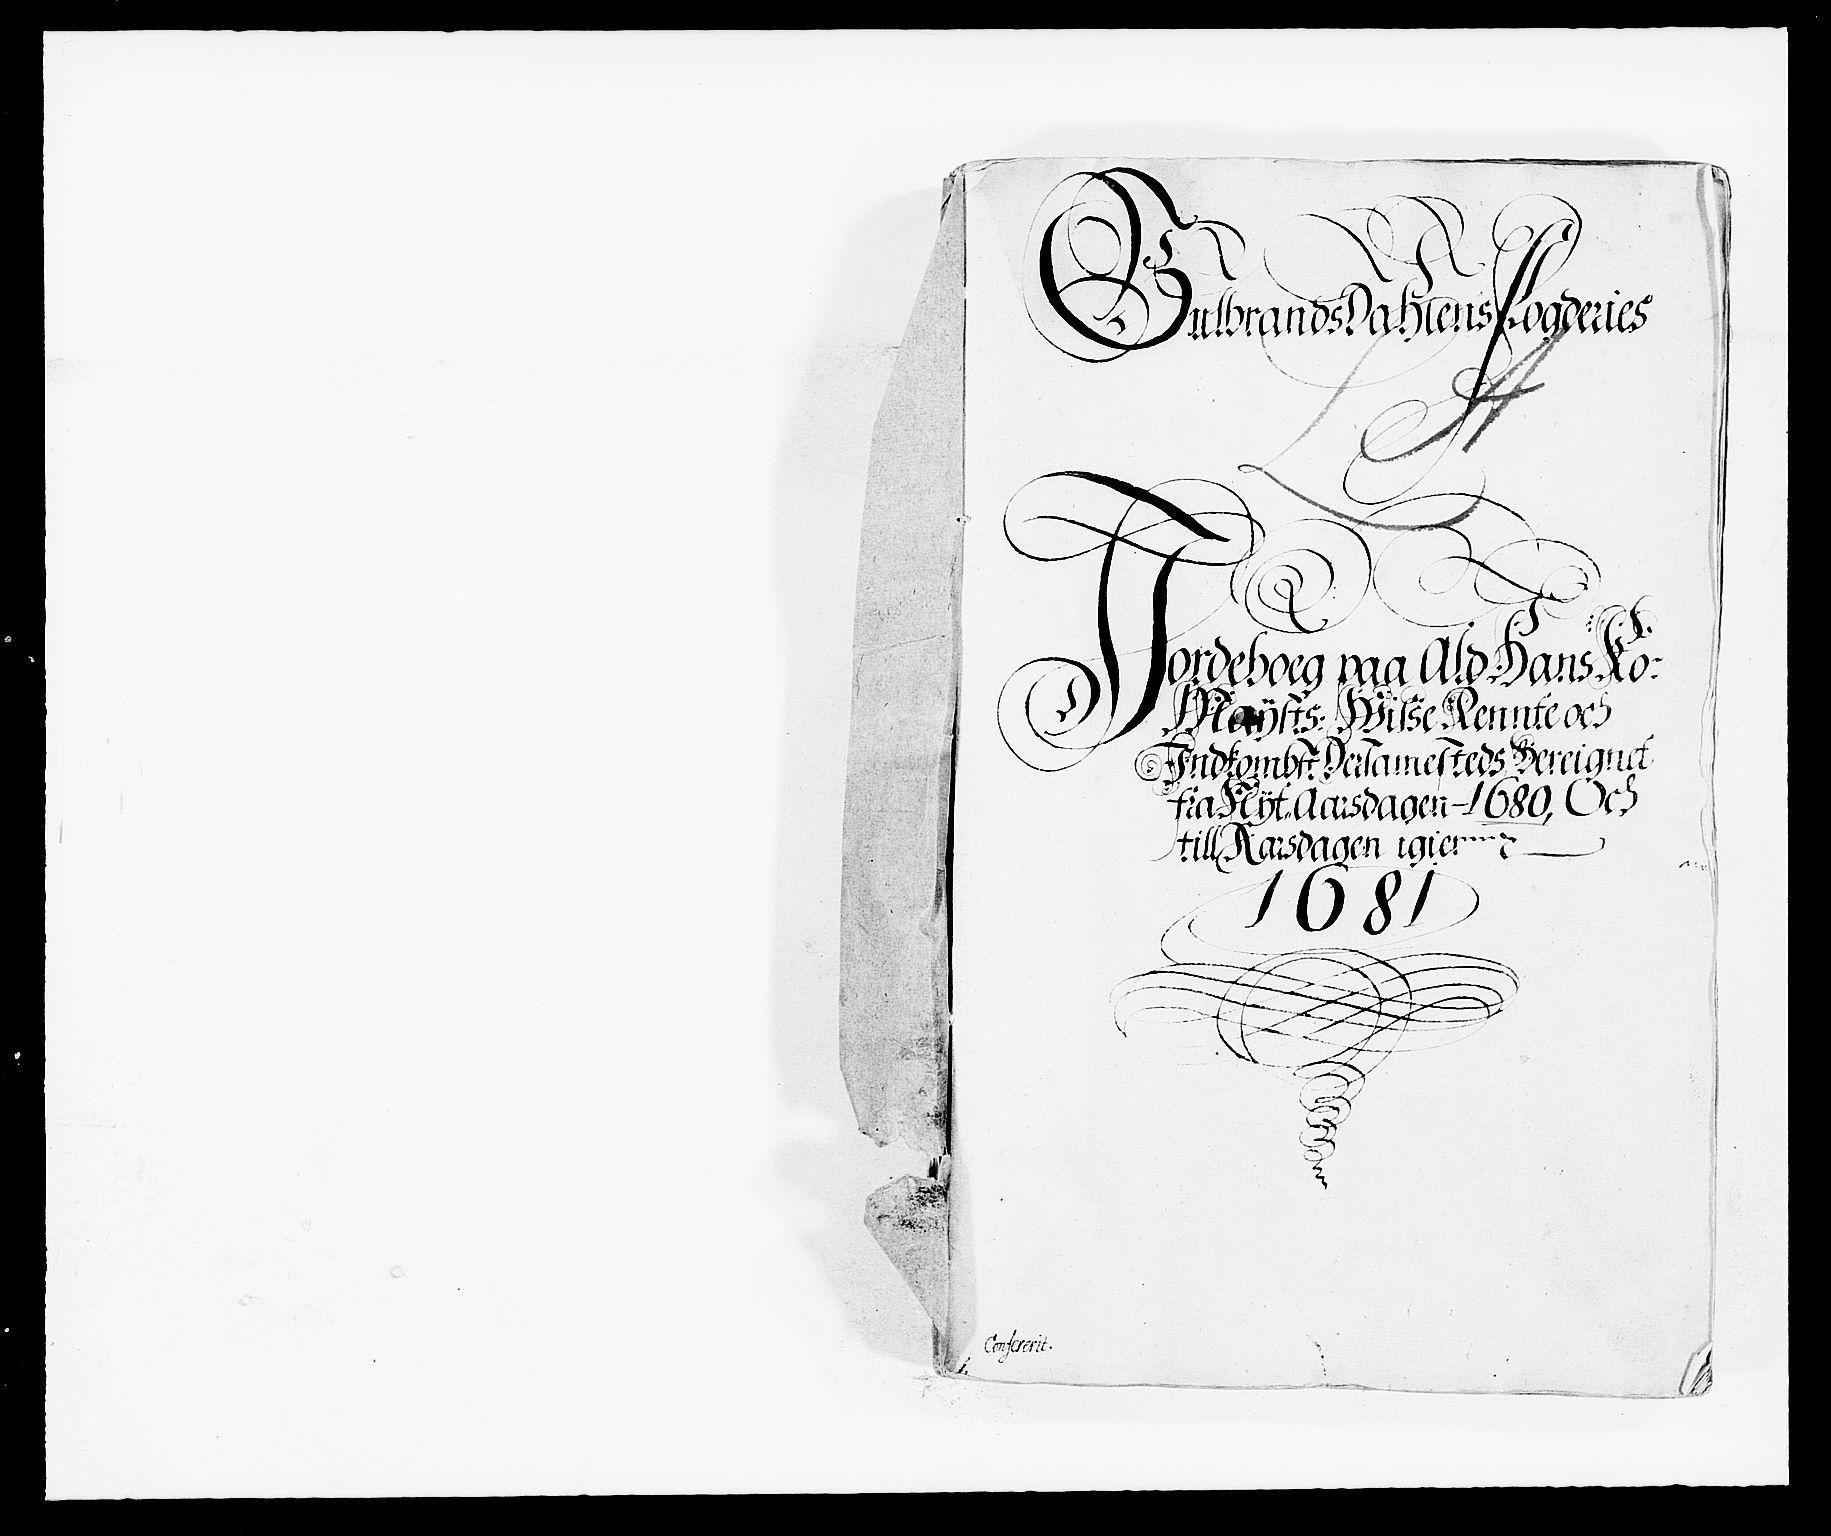 RA, Rentekammeret inntil 1814, Reviderte regnskaper, Fogderegnskap, R17/L1154: Fogderegnskap Gudbrandsdal, 1680, s. 19